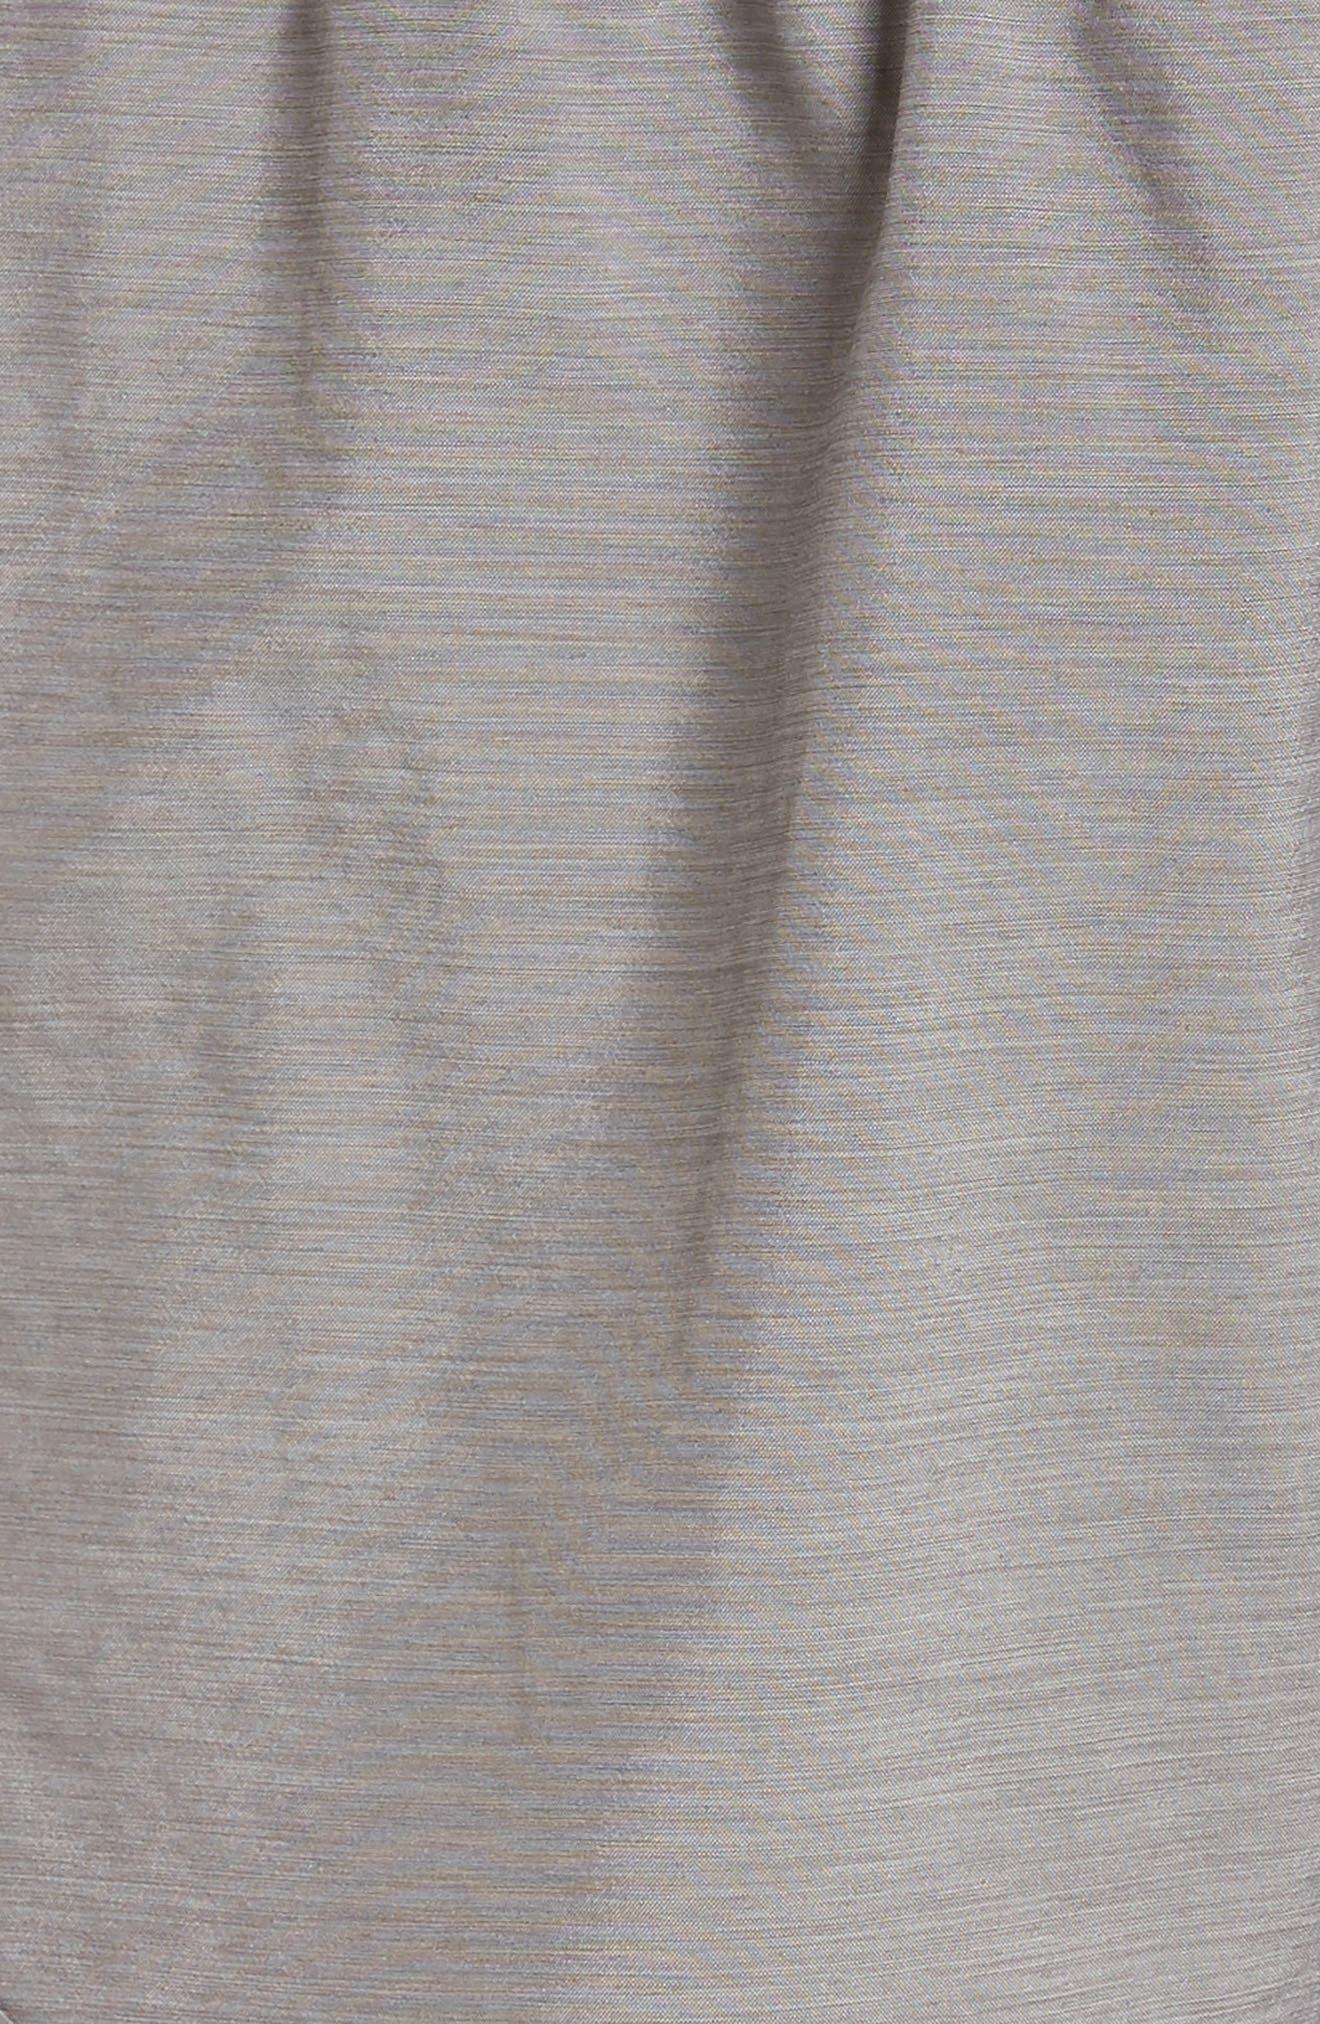 Dry Tempo Running Shorts,                             Alternate thumbnail 6, color,                             GUNSMOKE/ WOLF GREY